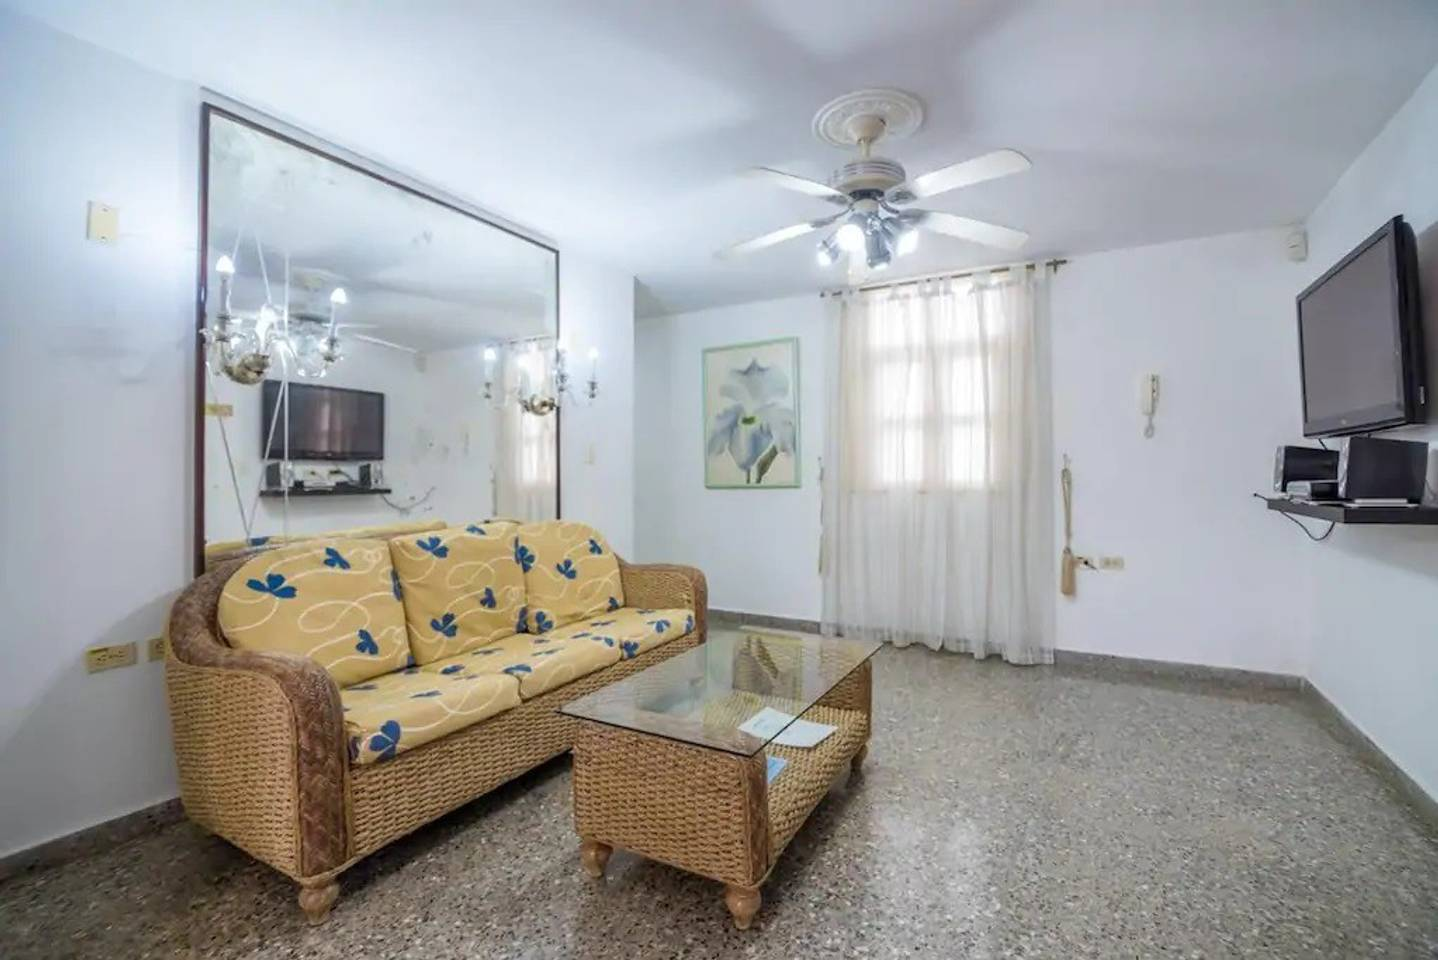 Apartment Villa Don Teto 8 Rooms  Luxury   Great Havana View photo 23332325